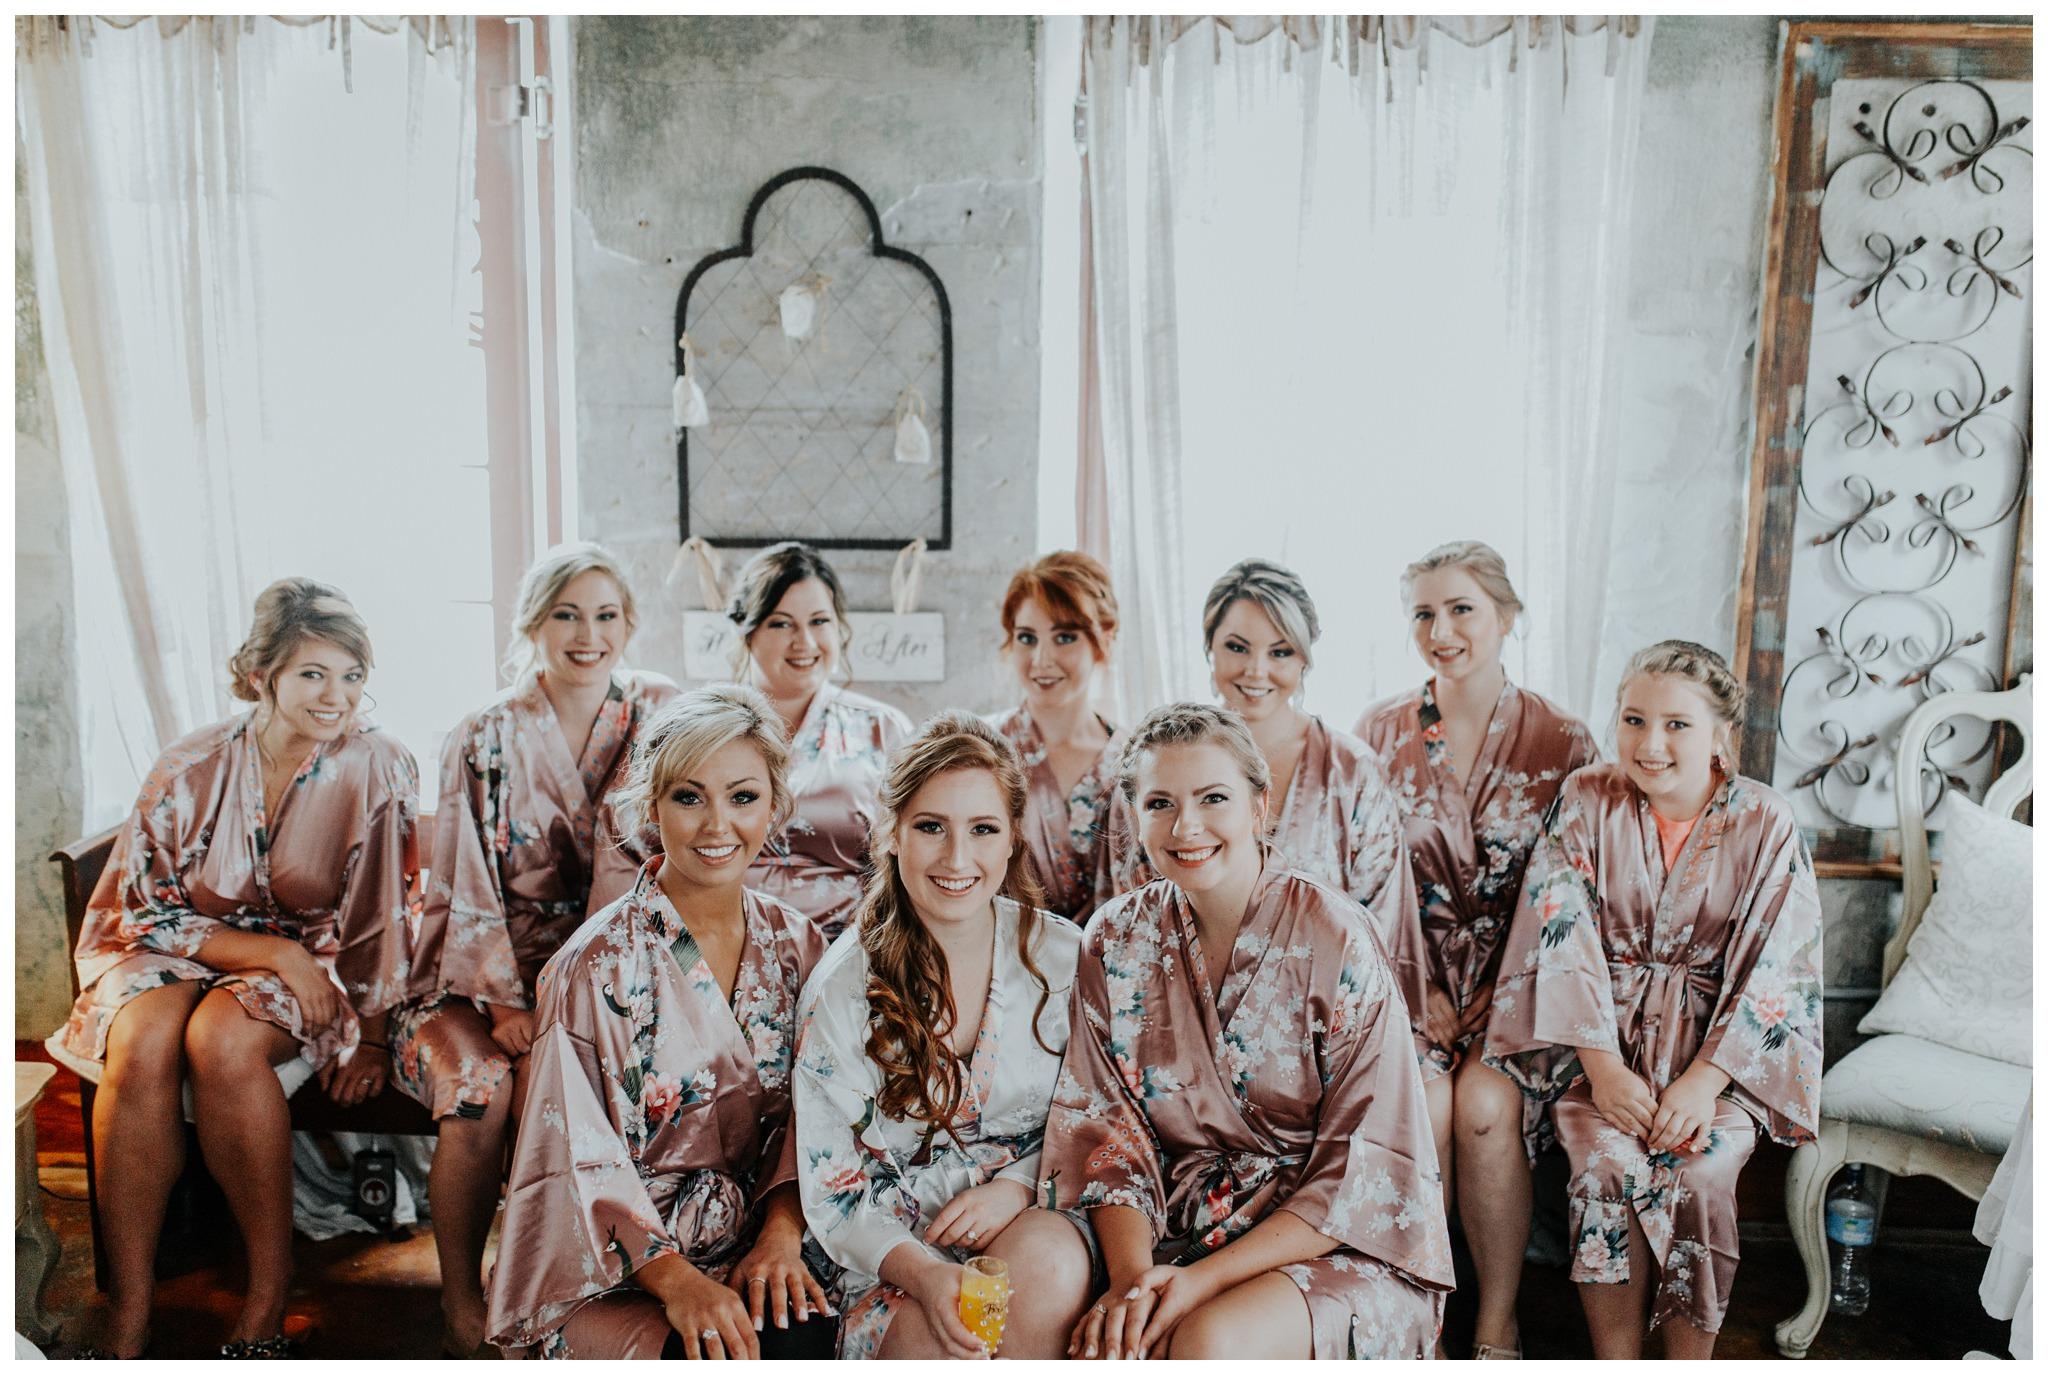 Summertime Olde Dobbin Station - Magnolia Wedding - The Woodlands Texas Wedding Photographer-2326.jpg